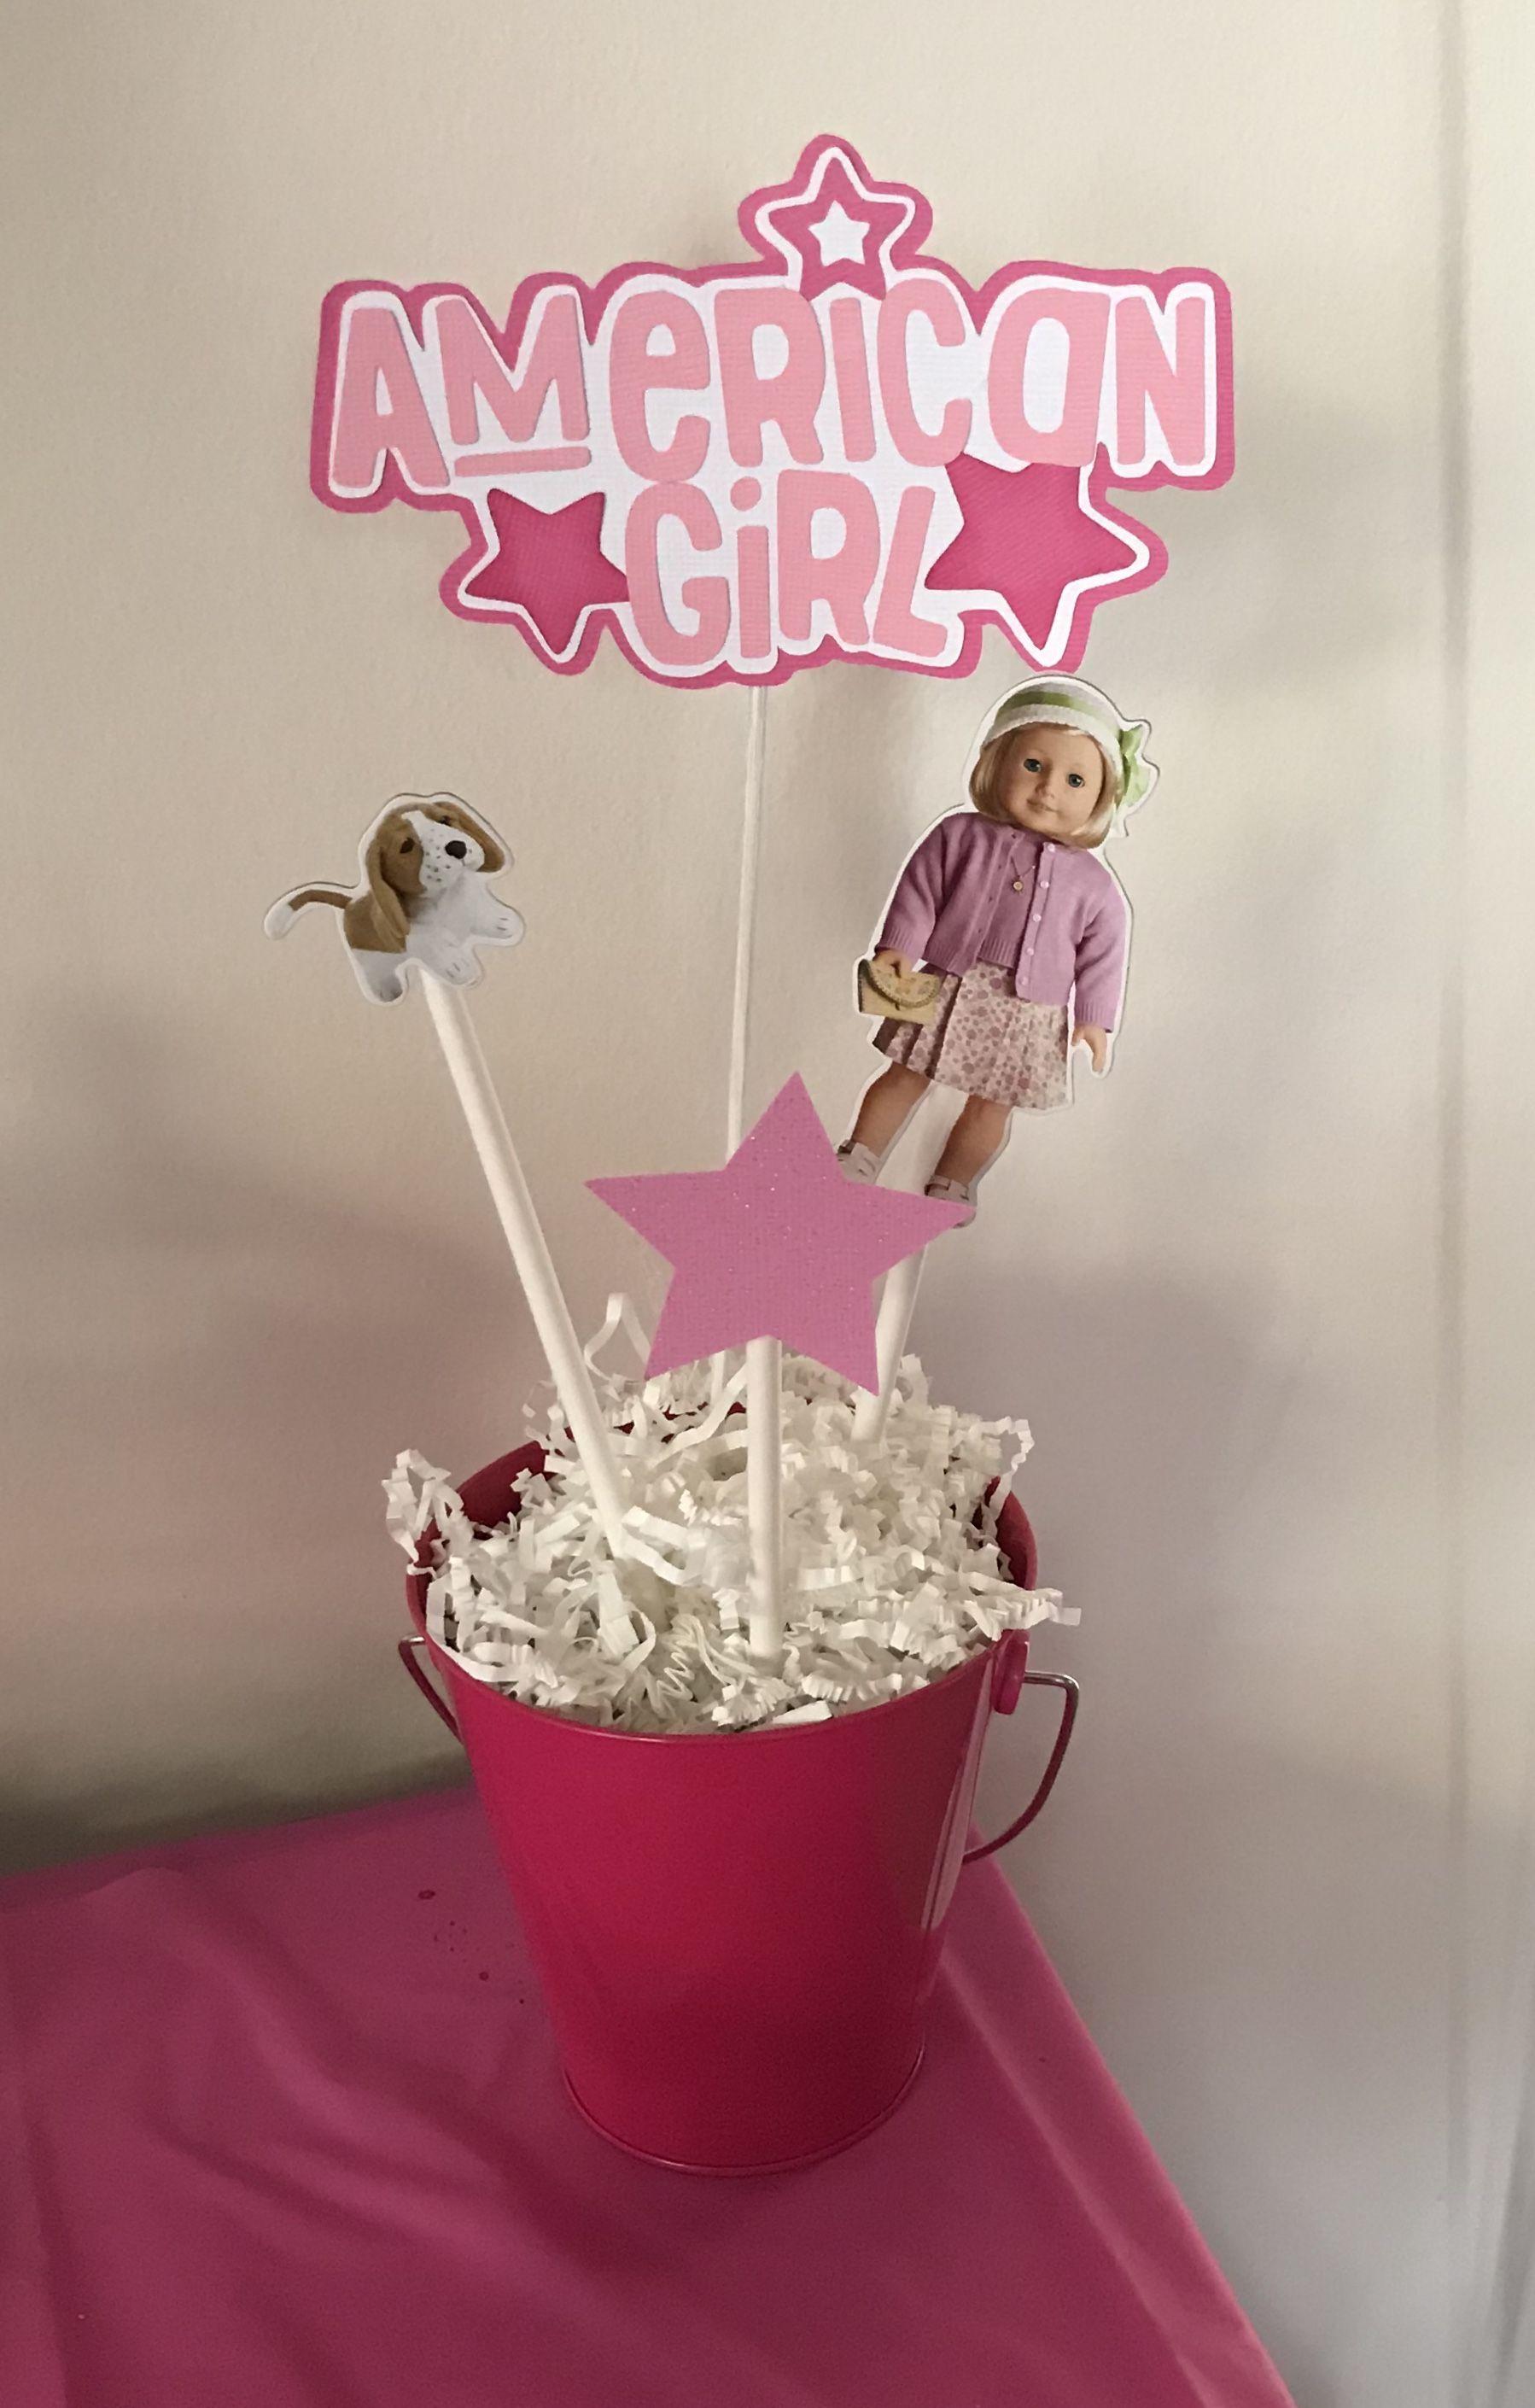 American girl birthday partydecorationsamerican girl centerpiece